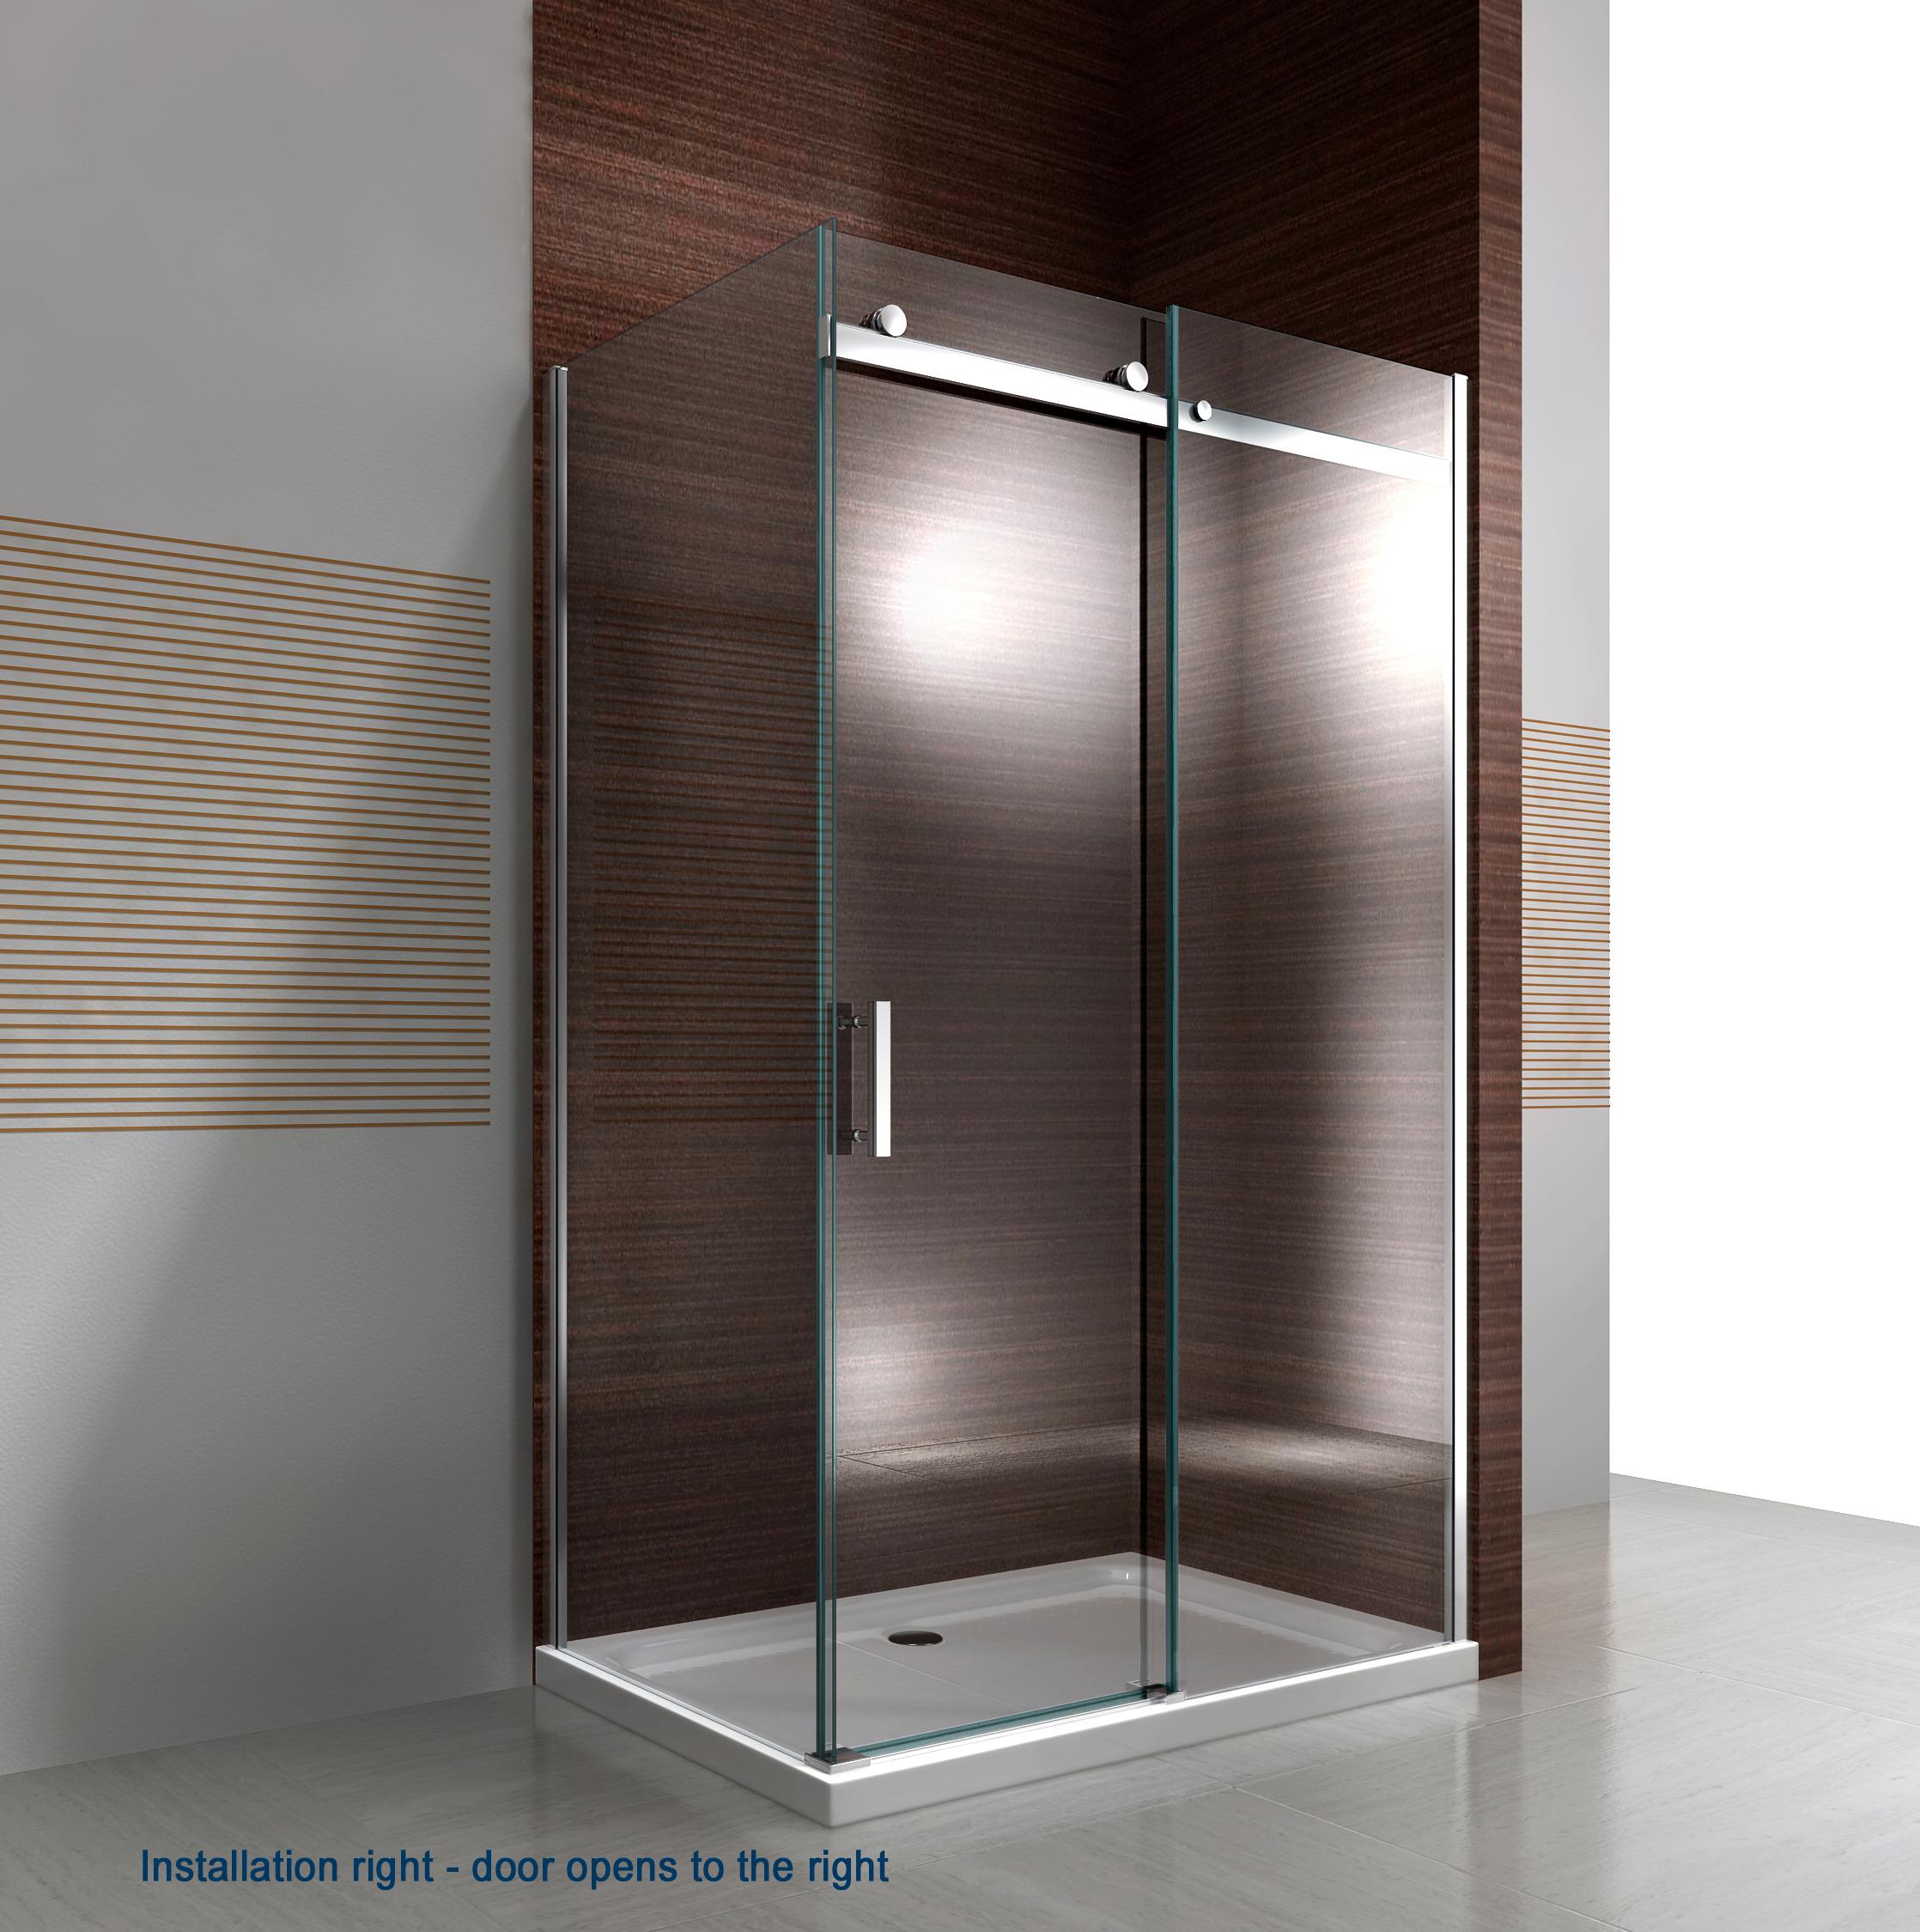 Shower enclosure EX806 - installation right